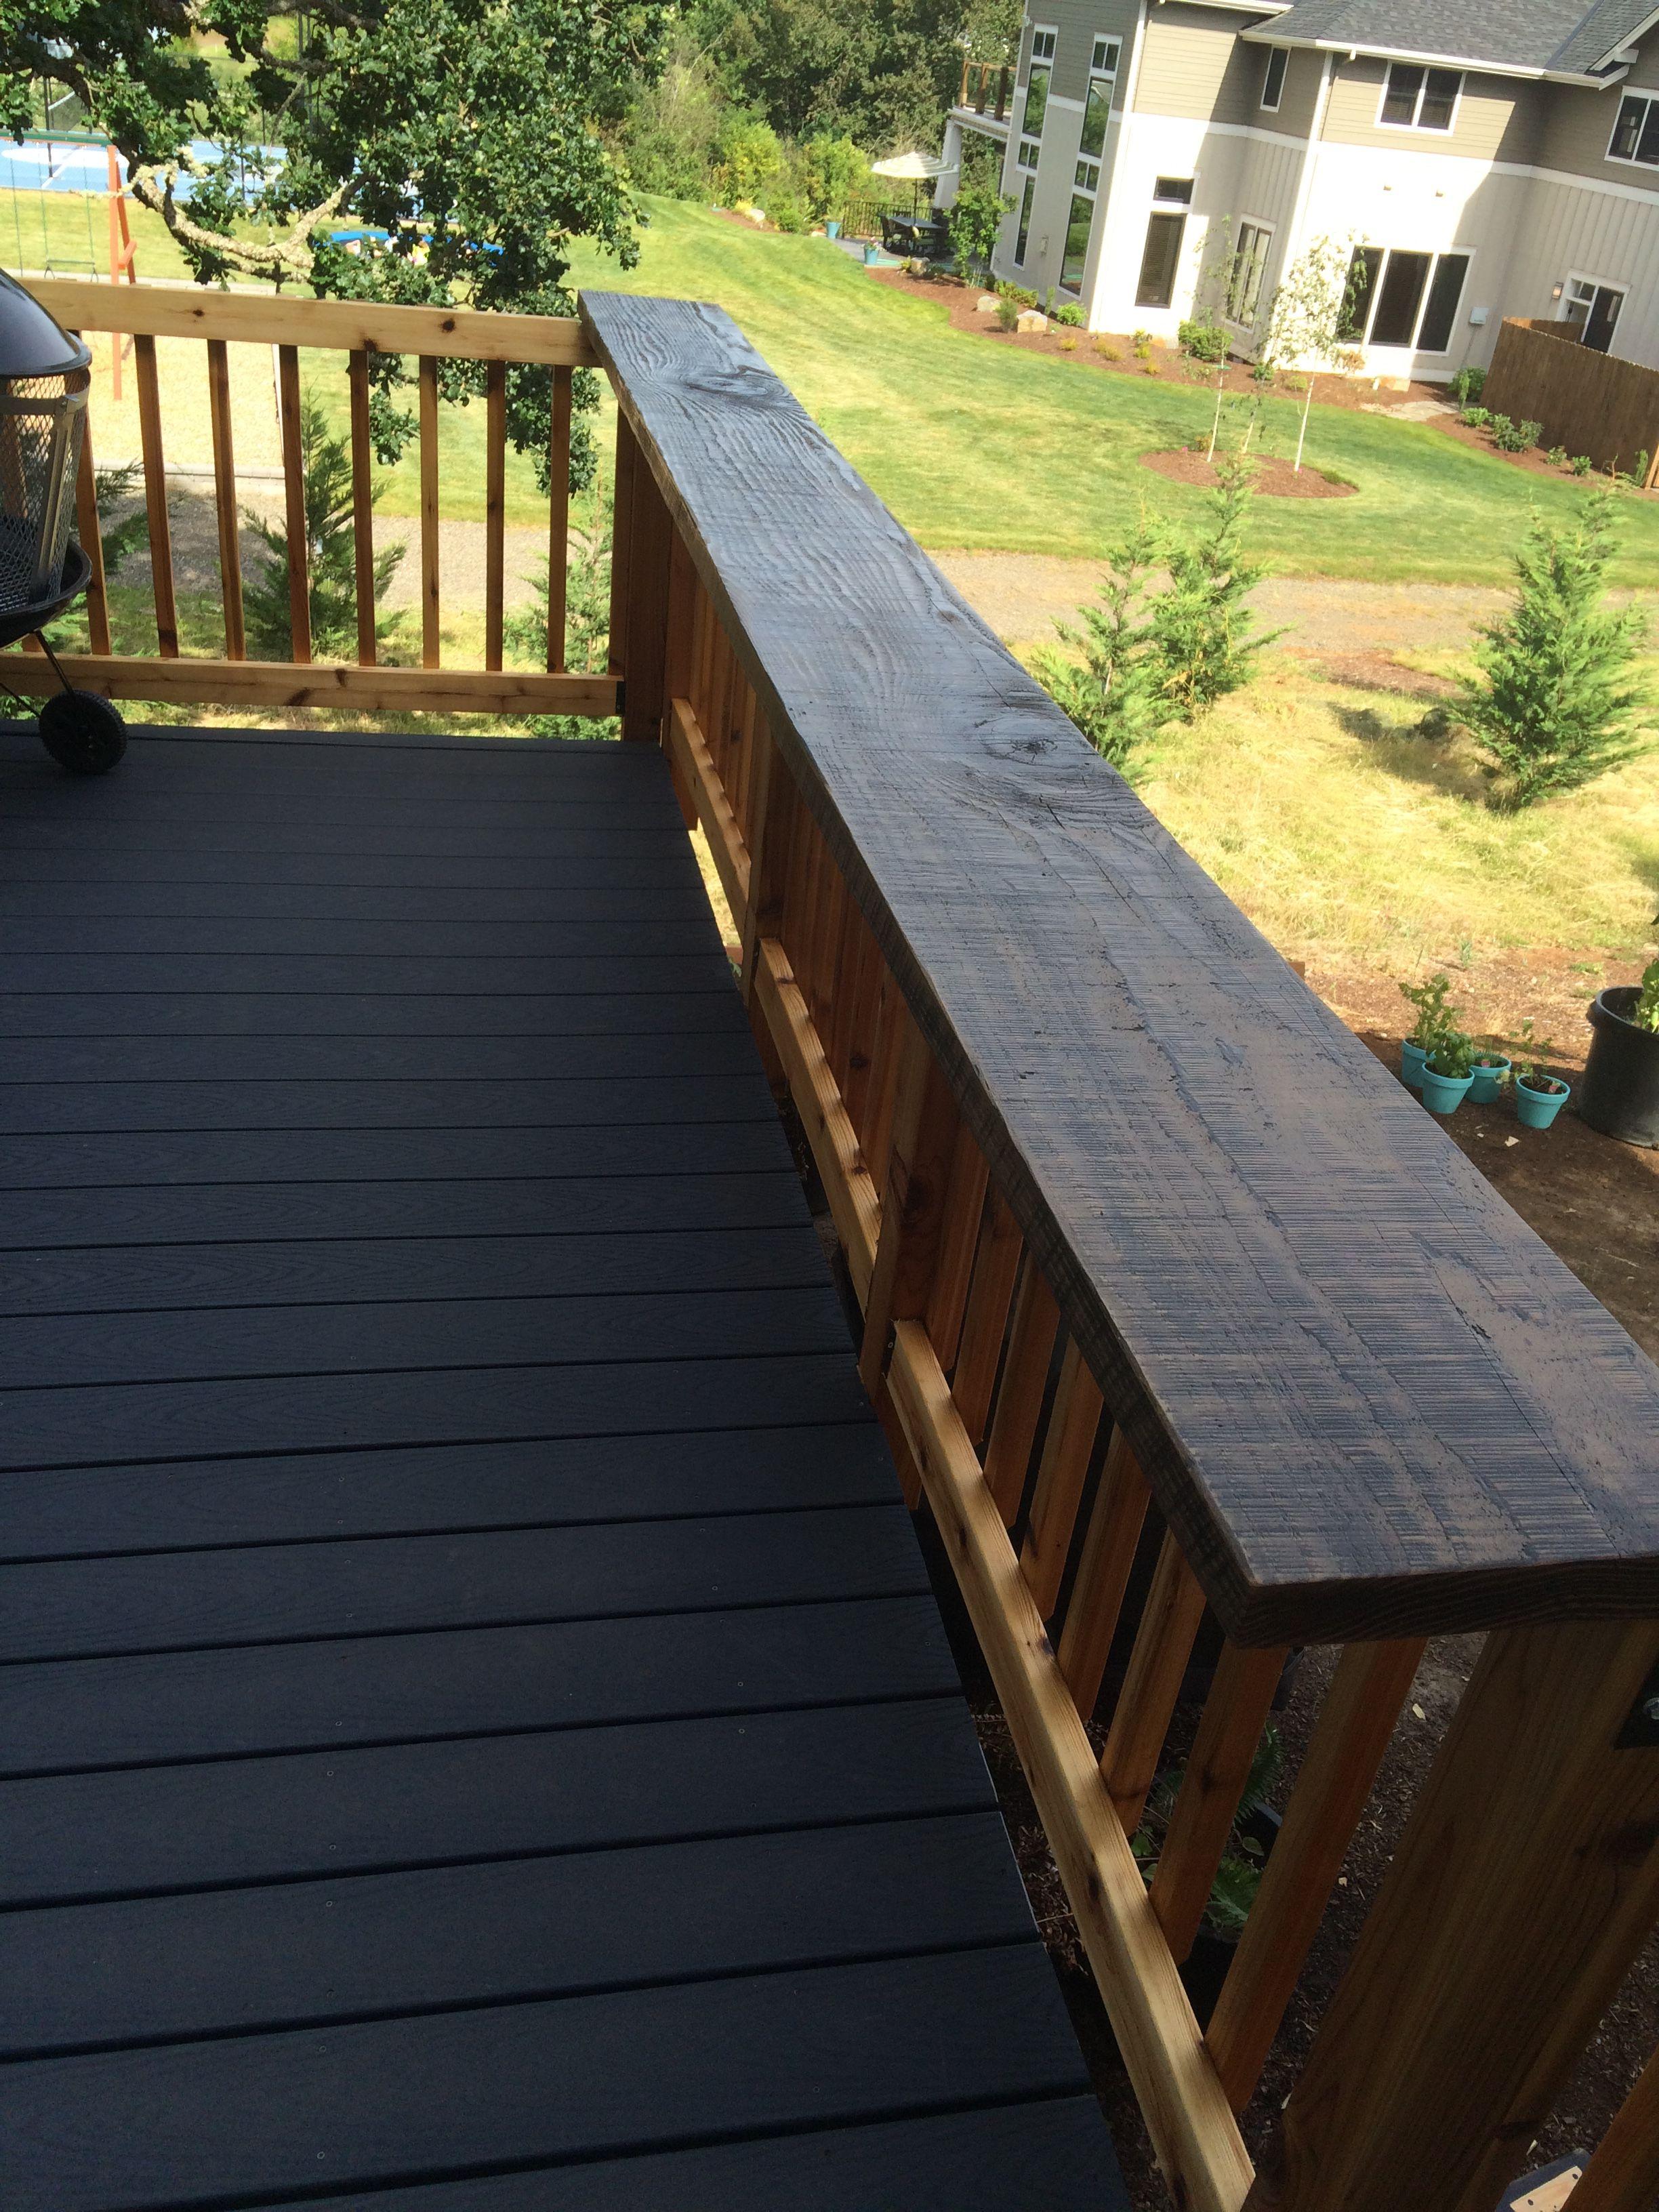 Bar Top Railing Out Of Rough Sawn Reclaim Barn Beams Deck Railing Design Patio Railing Railings Outdoor